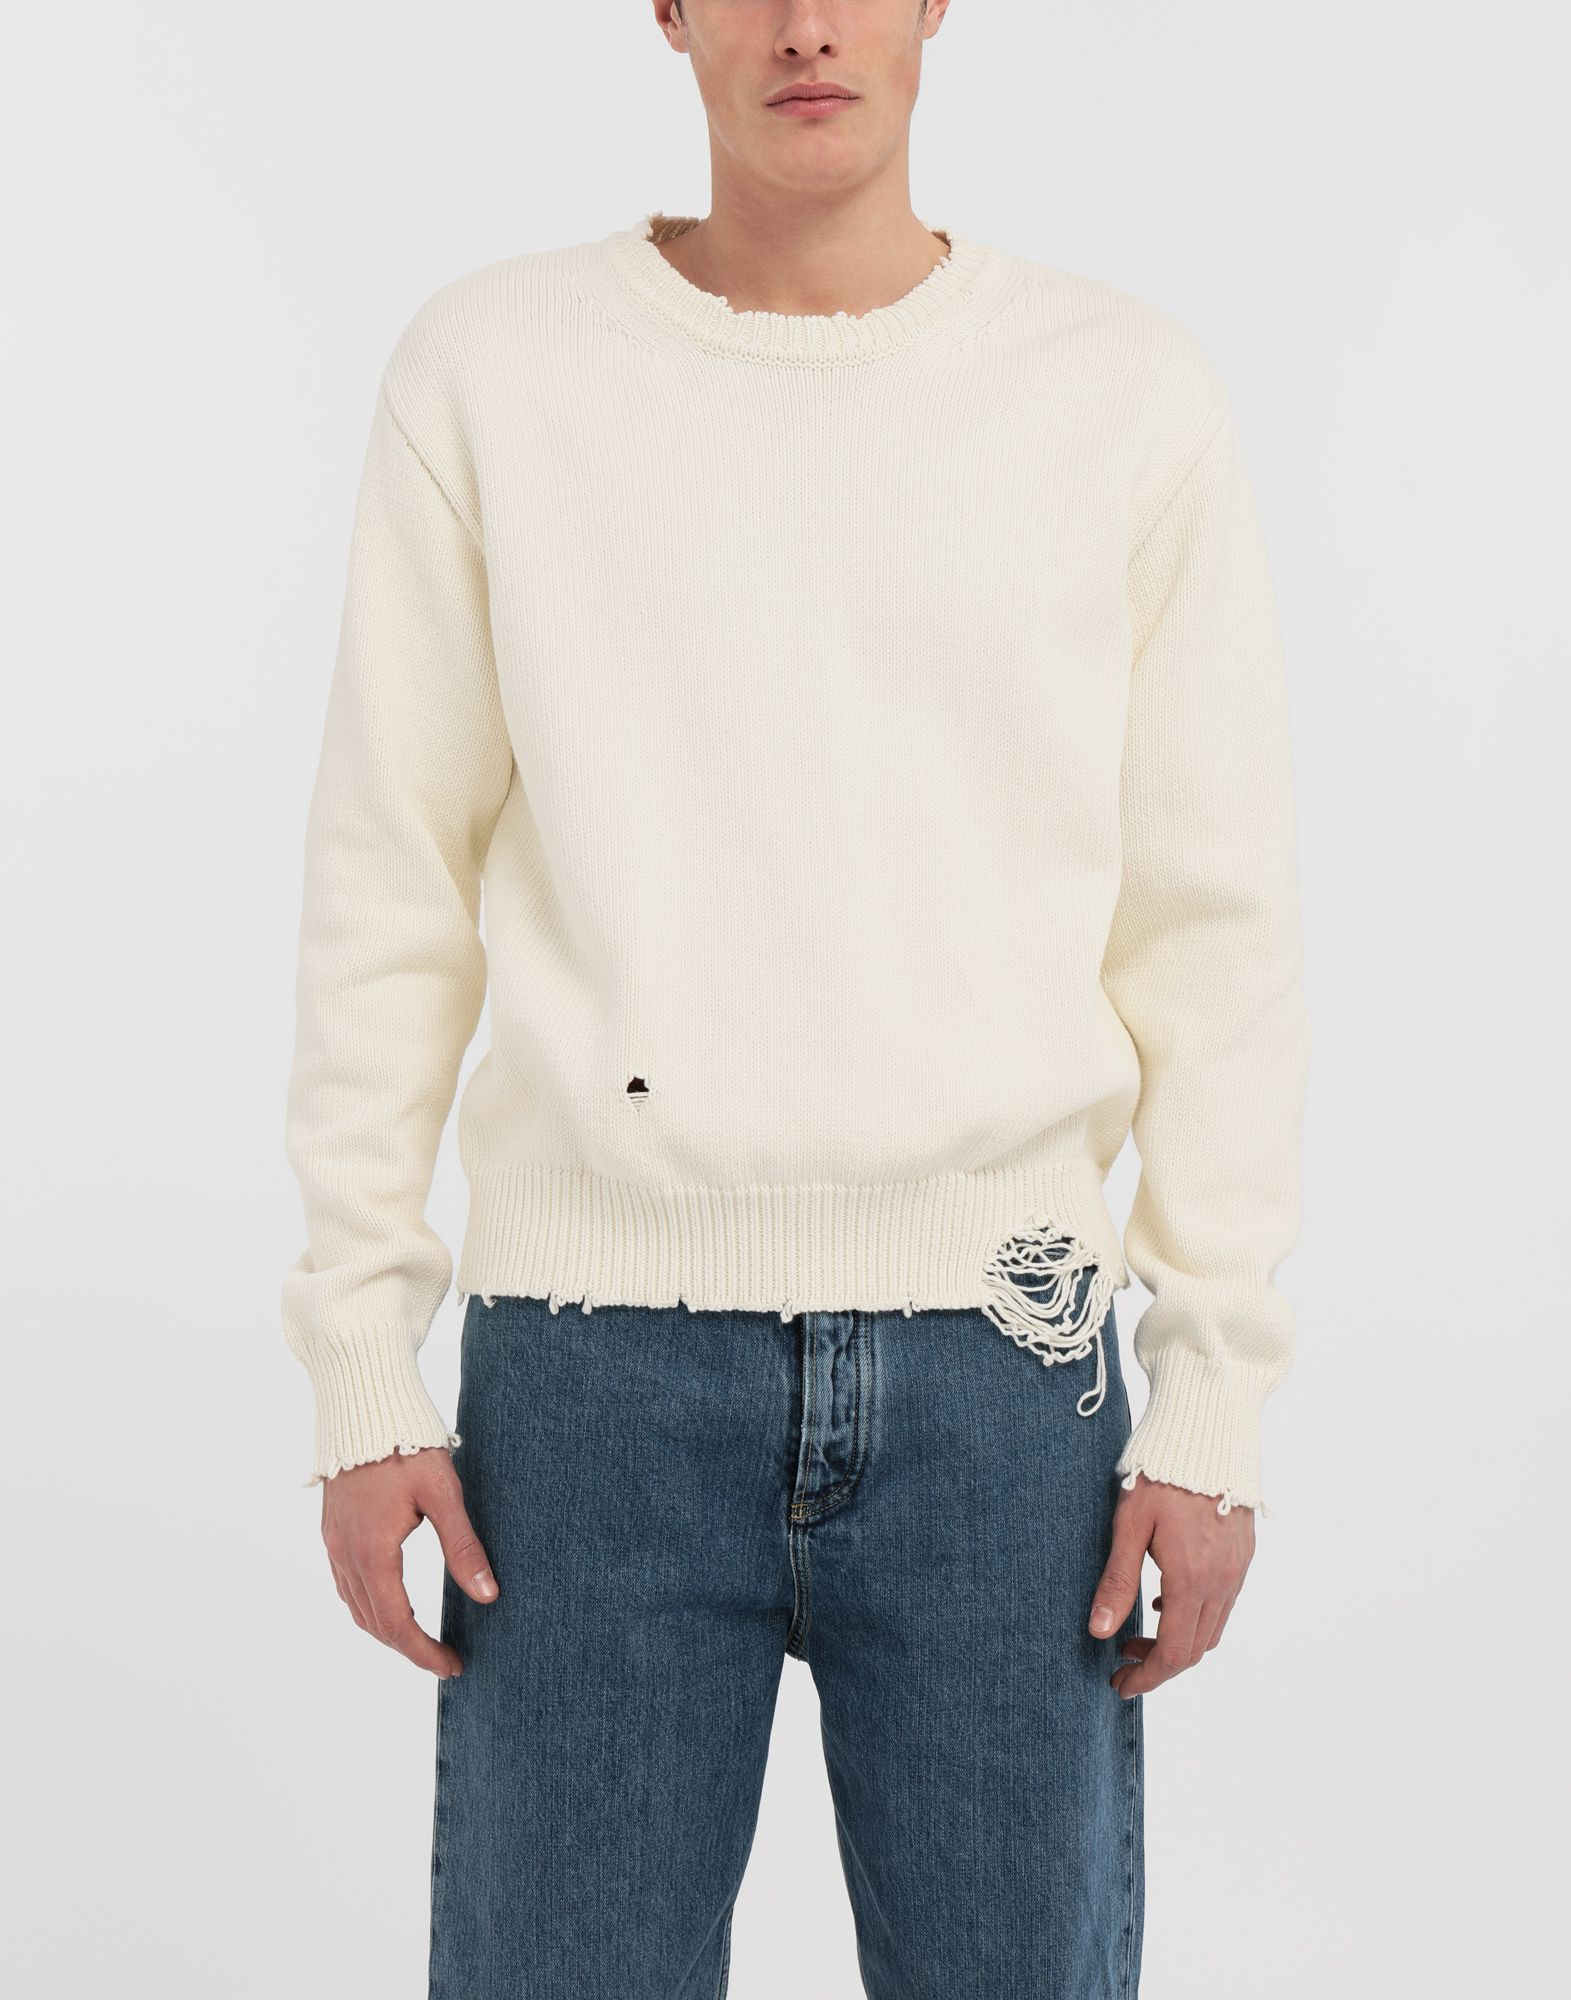 MAISON MARGIELA Destroyed knit pullover Crewneck sweater Man r